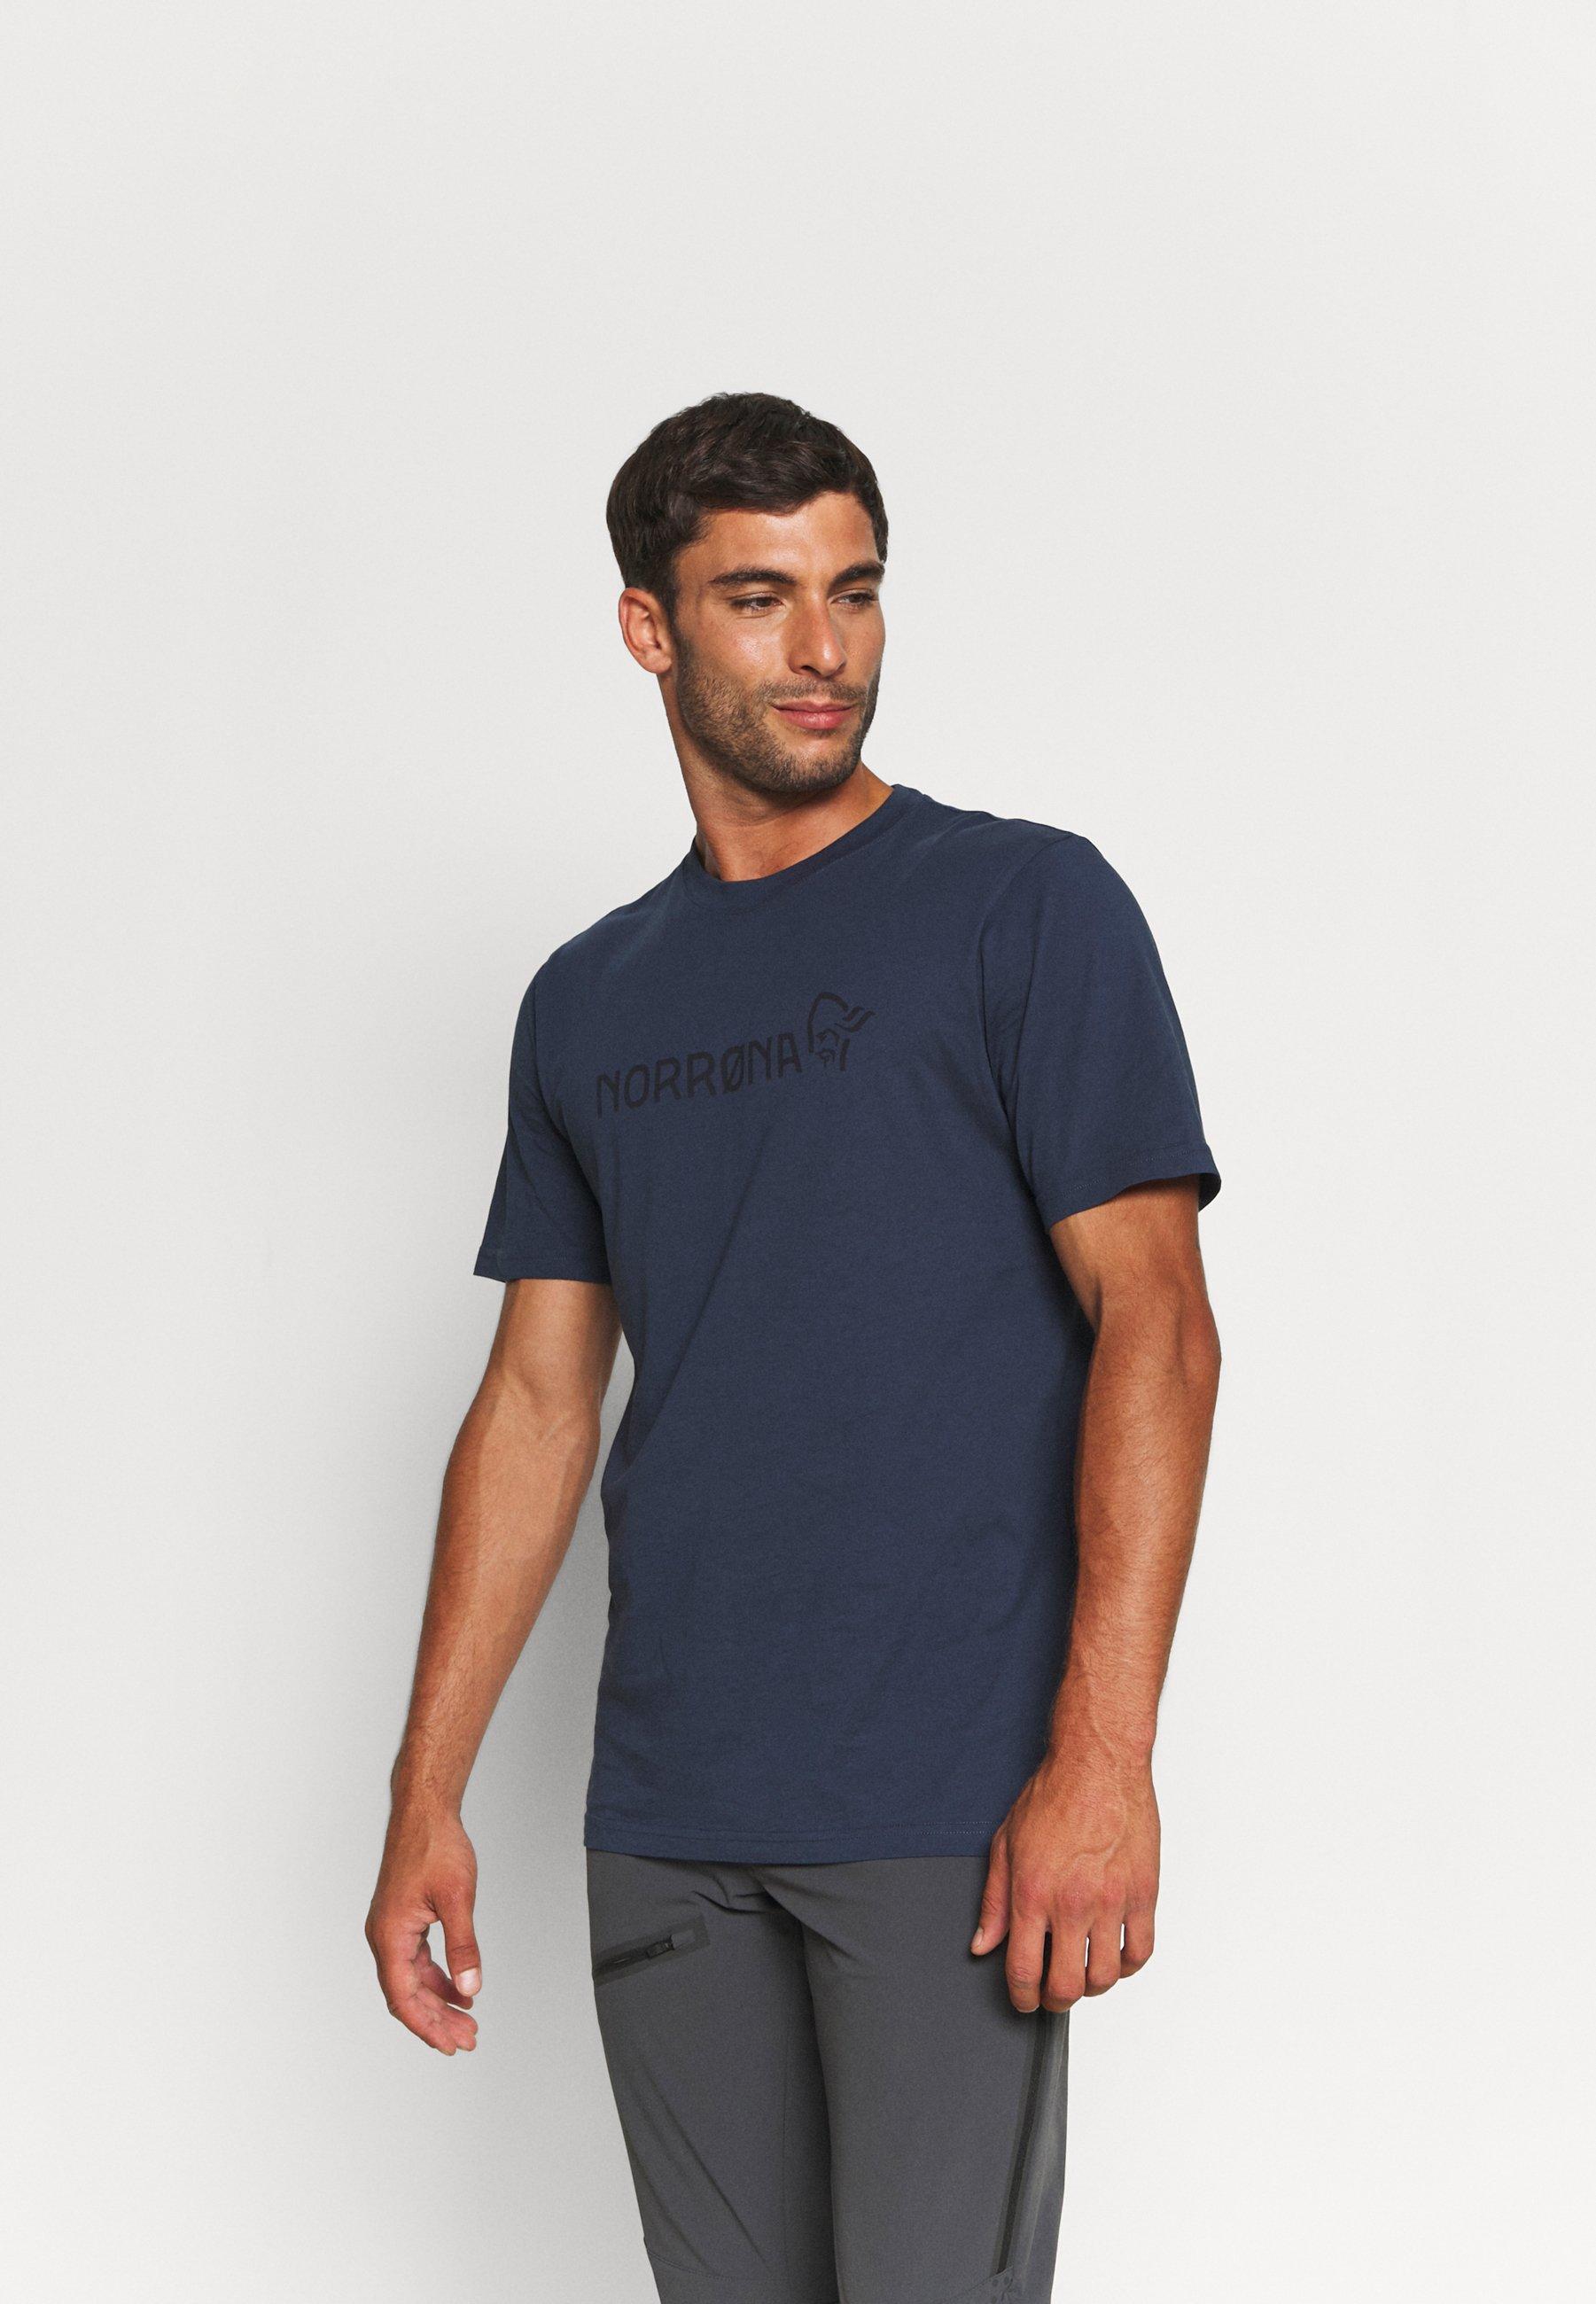 Uomo /29 - T-shirt con stampa